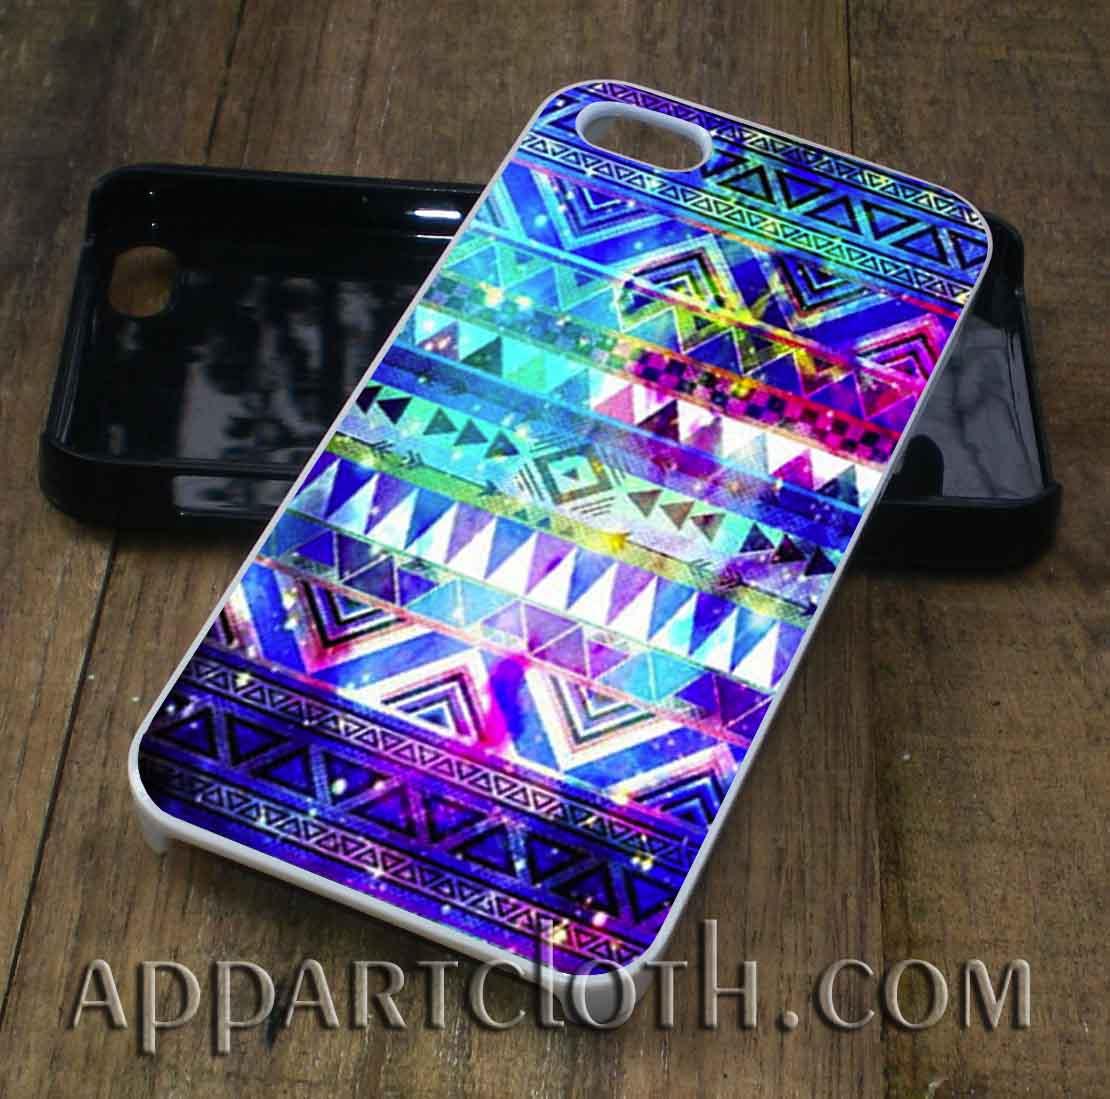 Aztec in Galaxy Nebula Space phone case